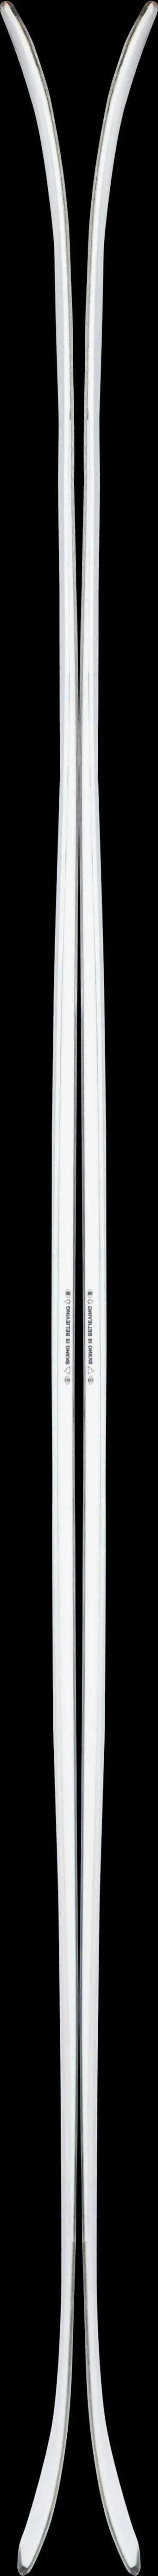 Line Vision 98 Skis